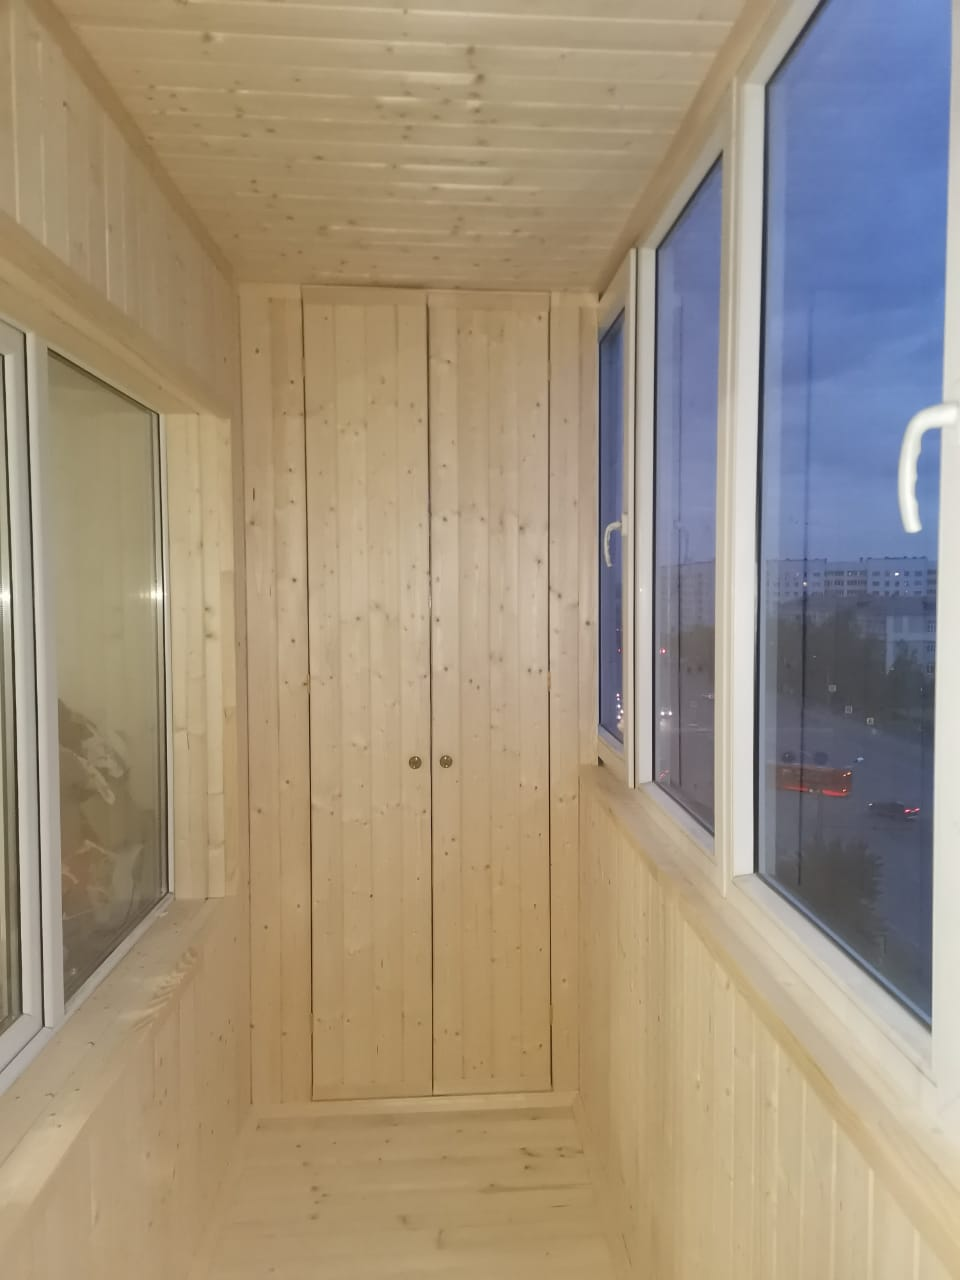 Обшивка вагонкой, установка шкафа для 6 метрового балкона - фото